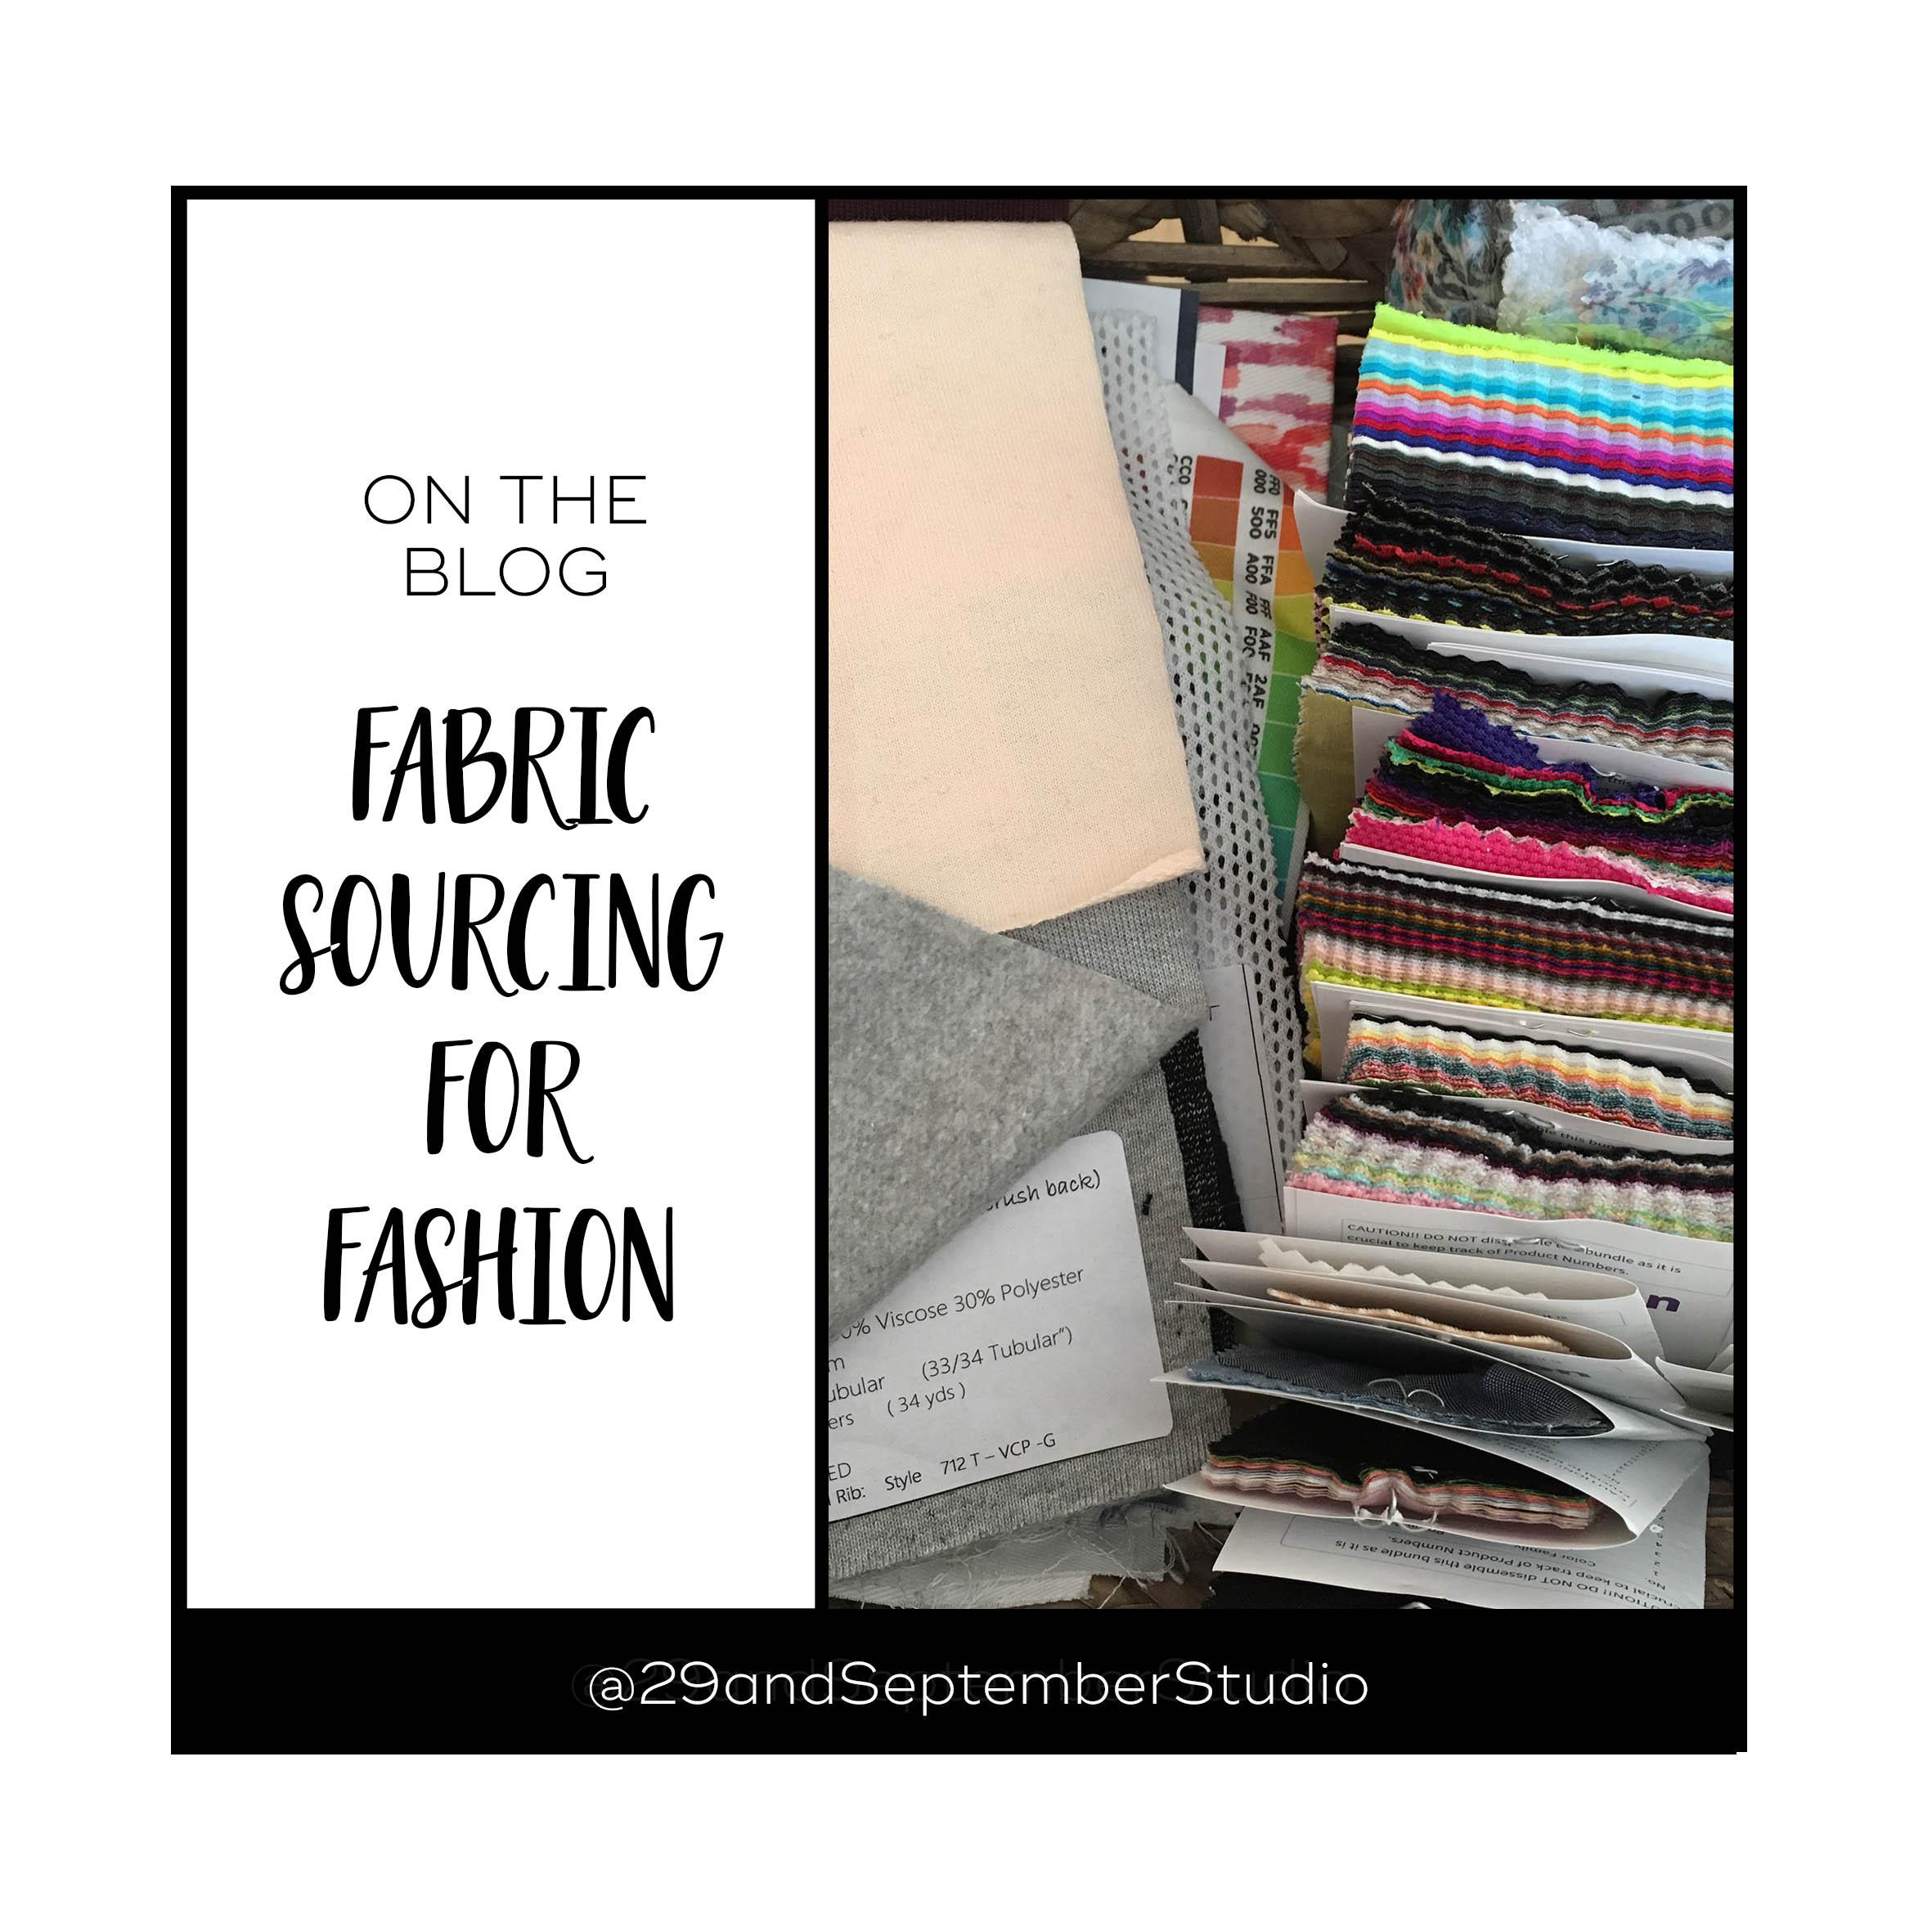 Sourcing fabrics